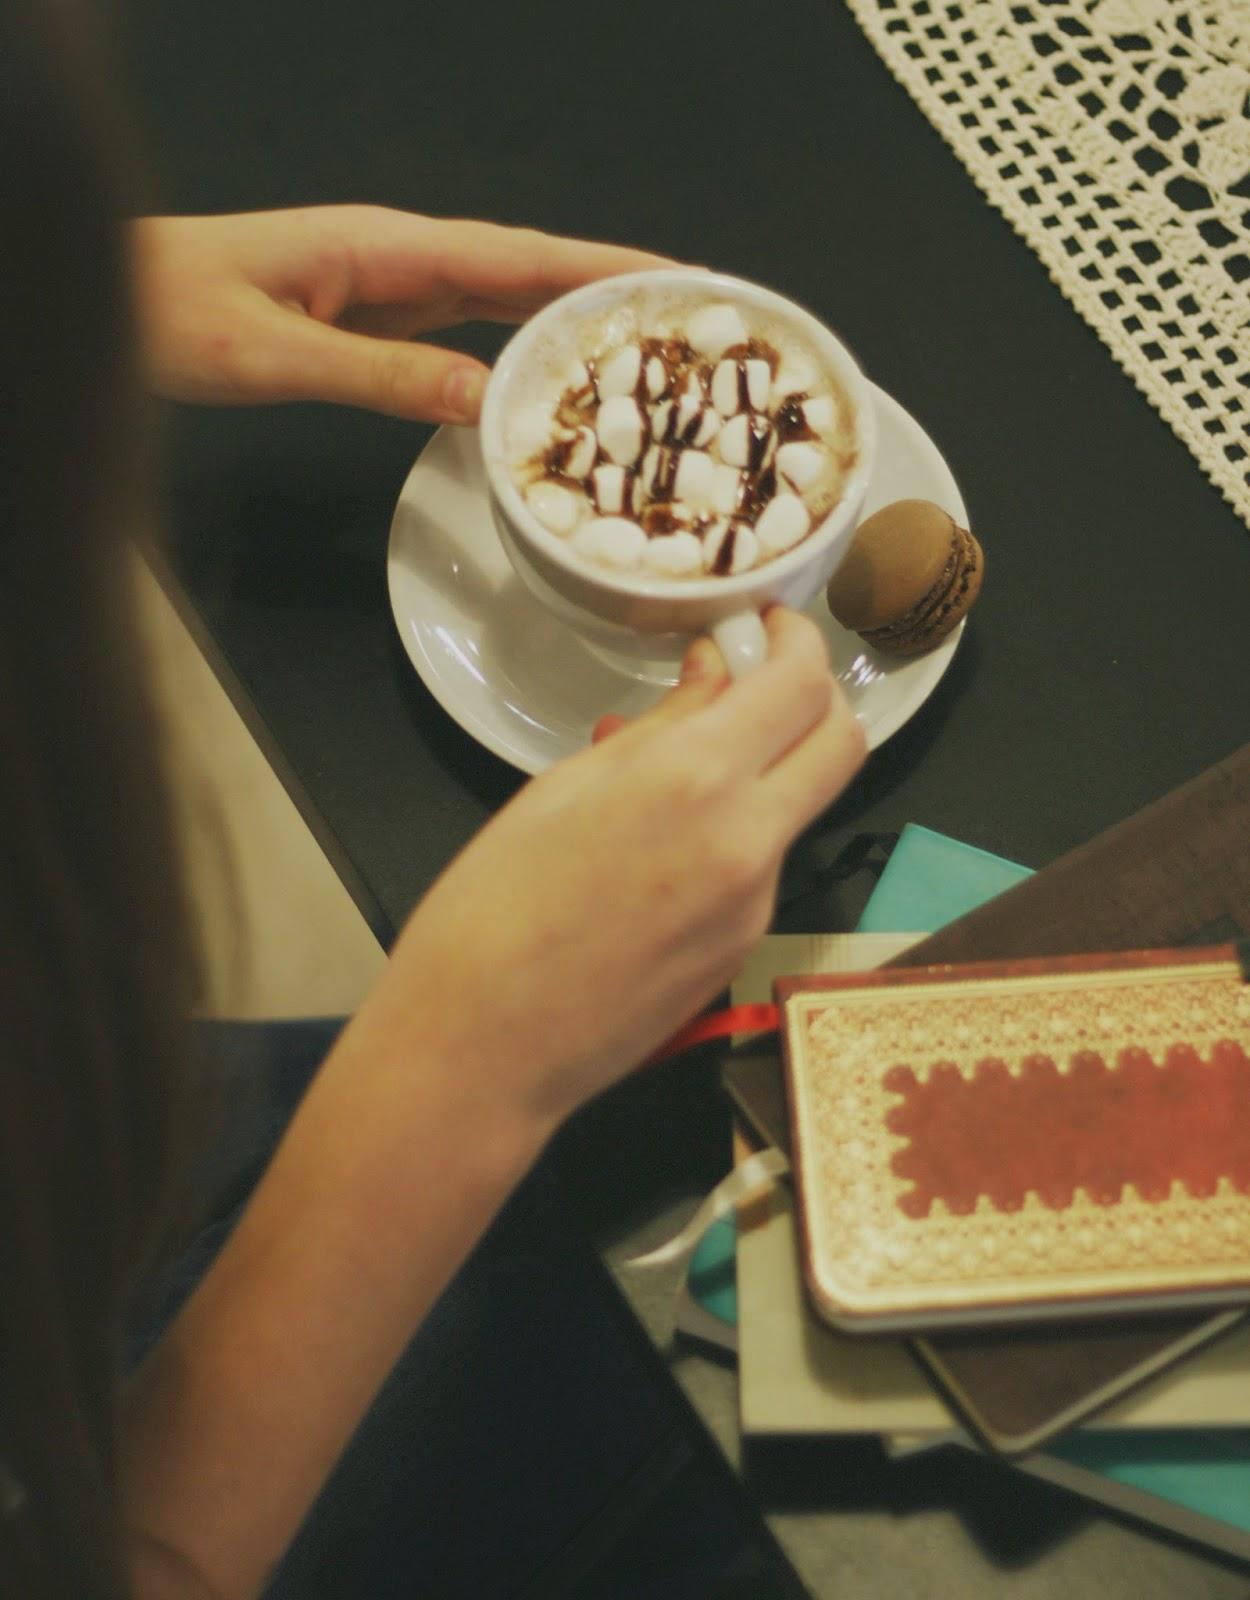 hot cocoa, sweet treats, coffee shop, cafe